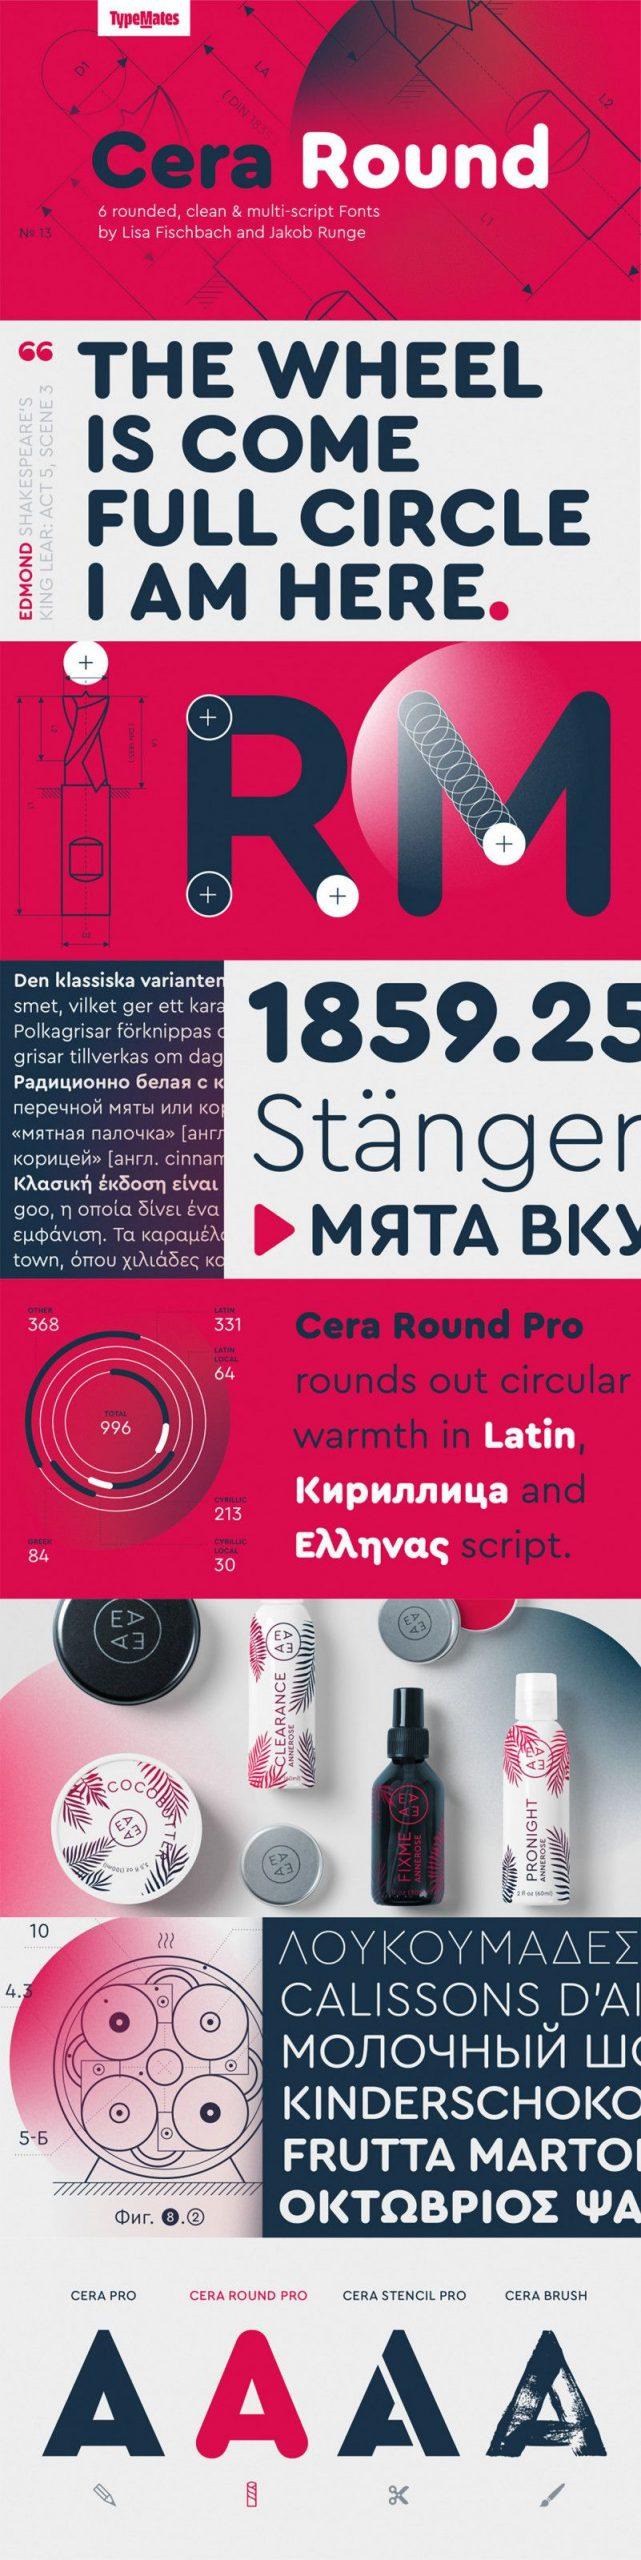 cera-round-pro-font-family-2